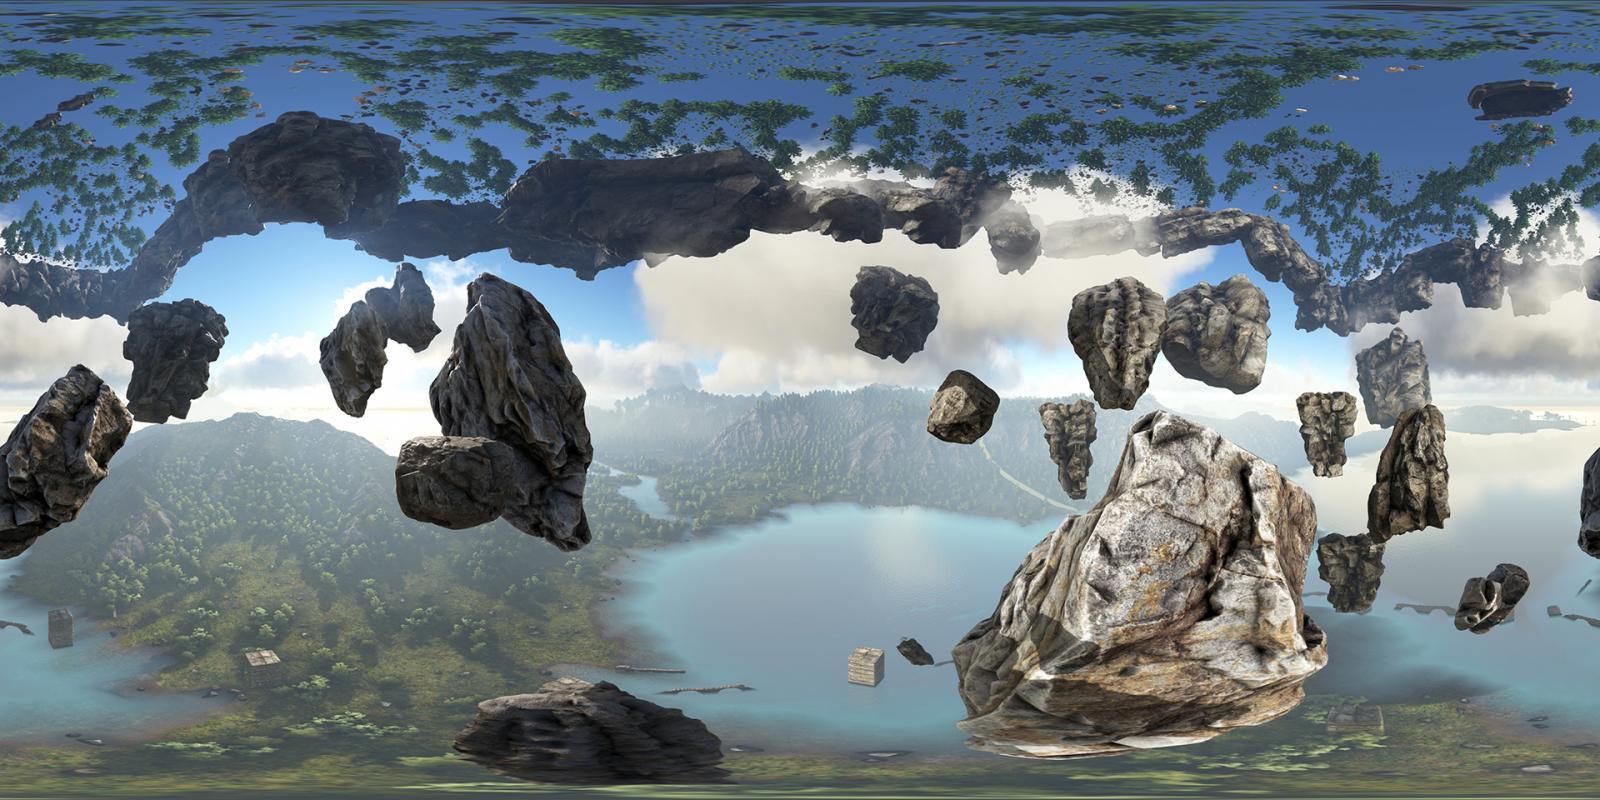 large.58d5b7541bd0d_FataL1ty-DefyingGravity-Panoramic360Stereoscopic3D.jpg